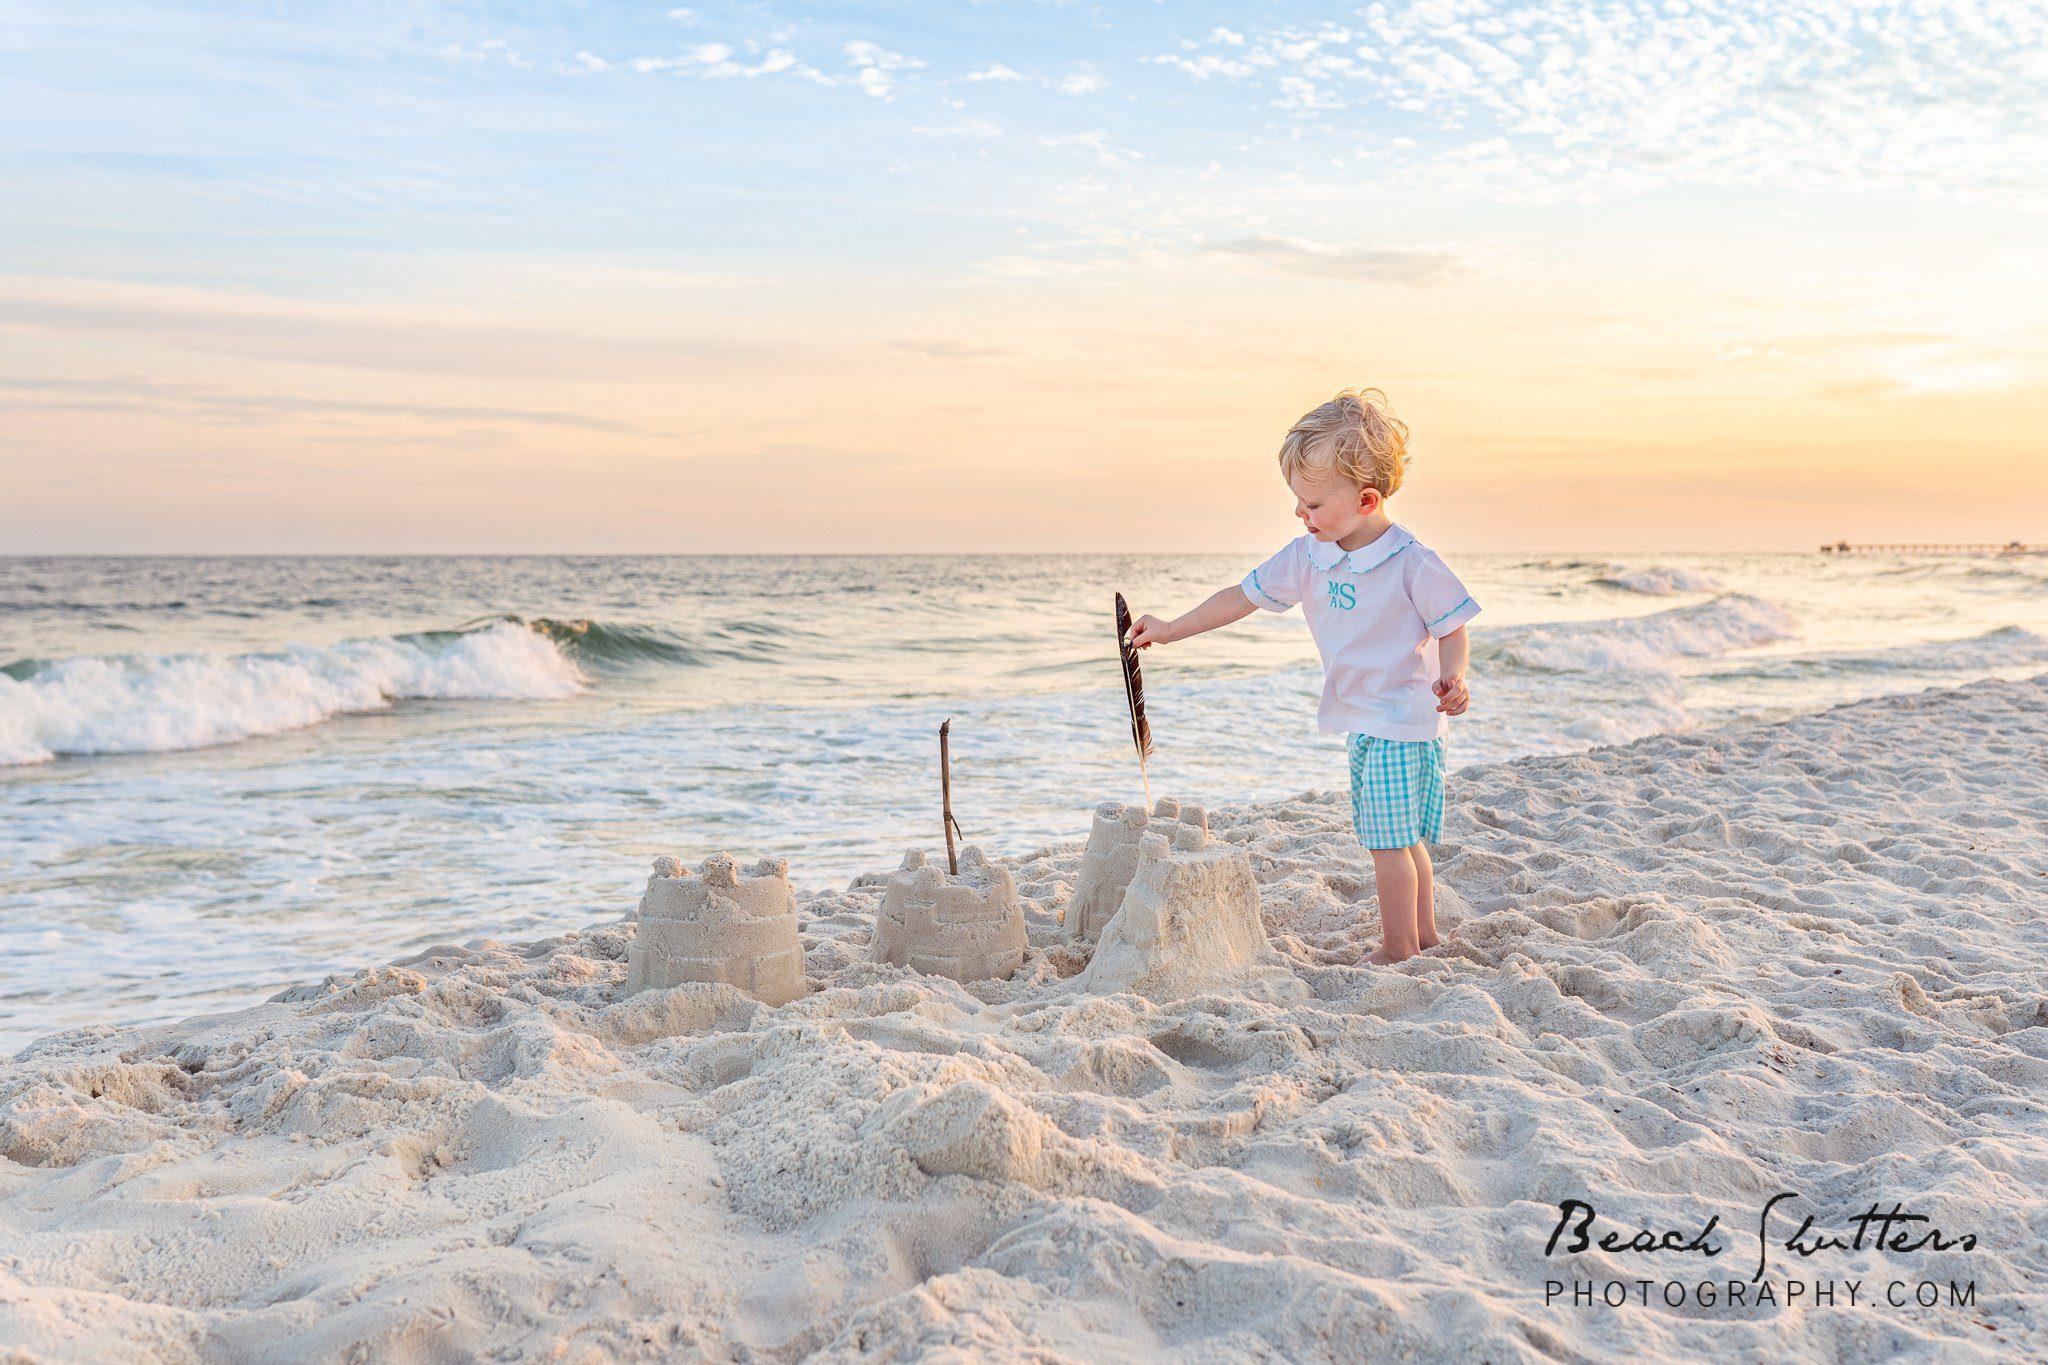 Alabama Sandcastles